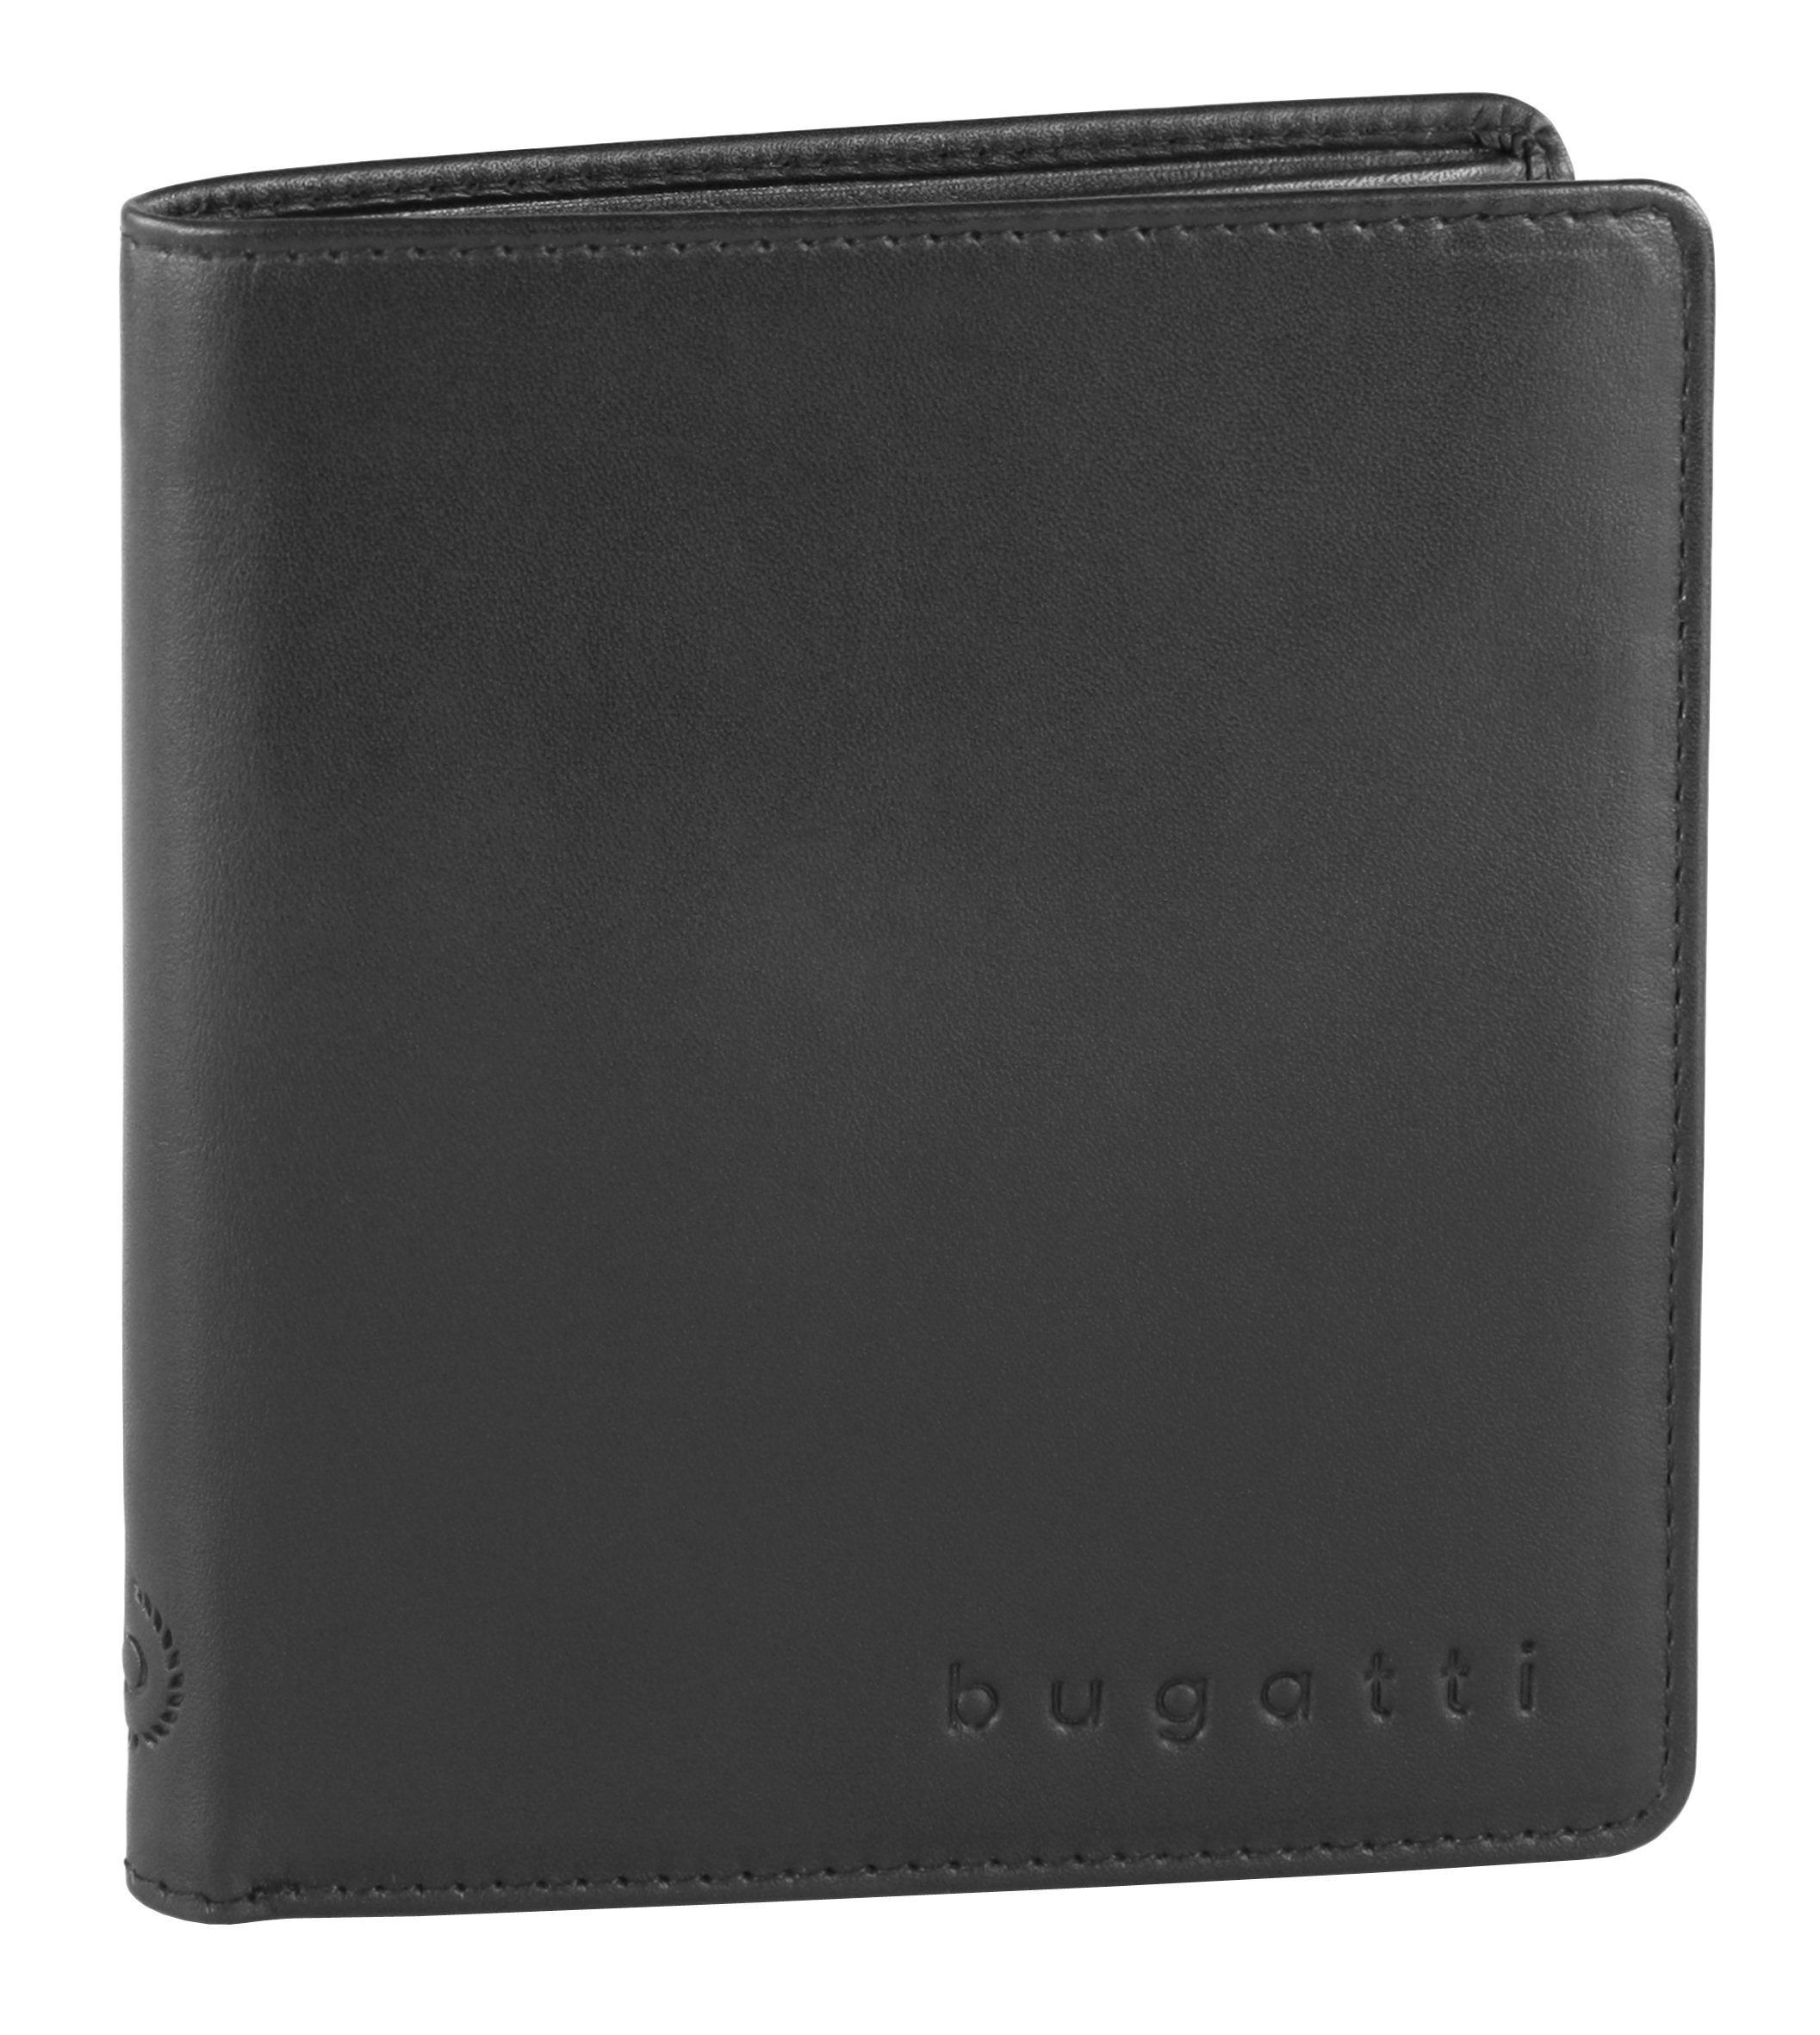 bugatti Kreditkartenetui mit RFID-Technologie